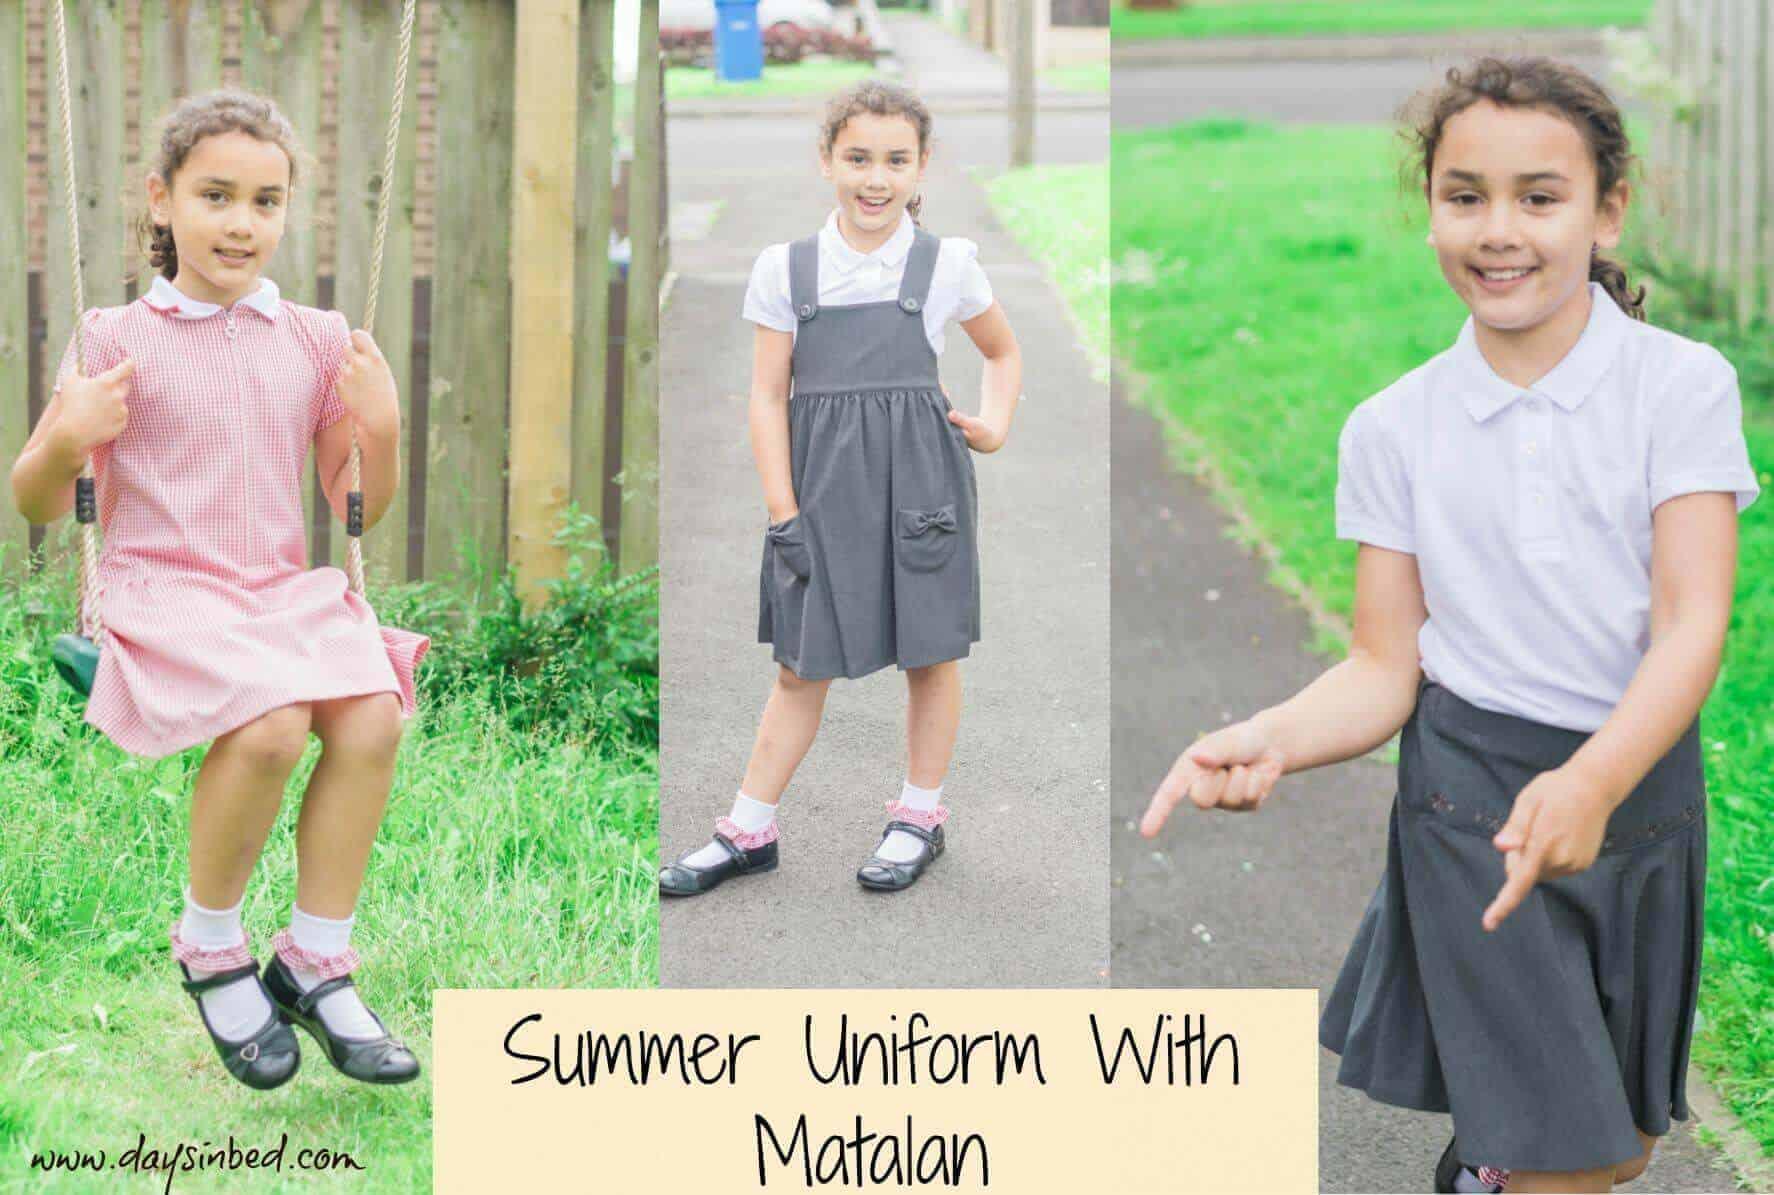 575702b9c0 Matalan Uniform For Girls A Review · The Inspiration Edit